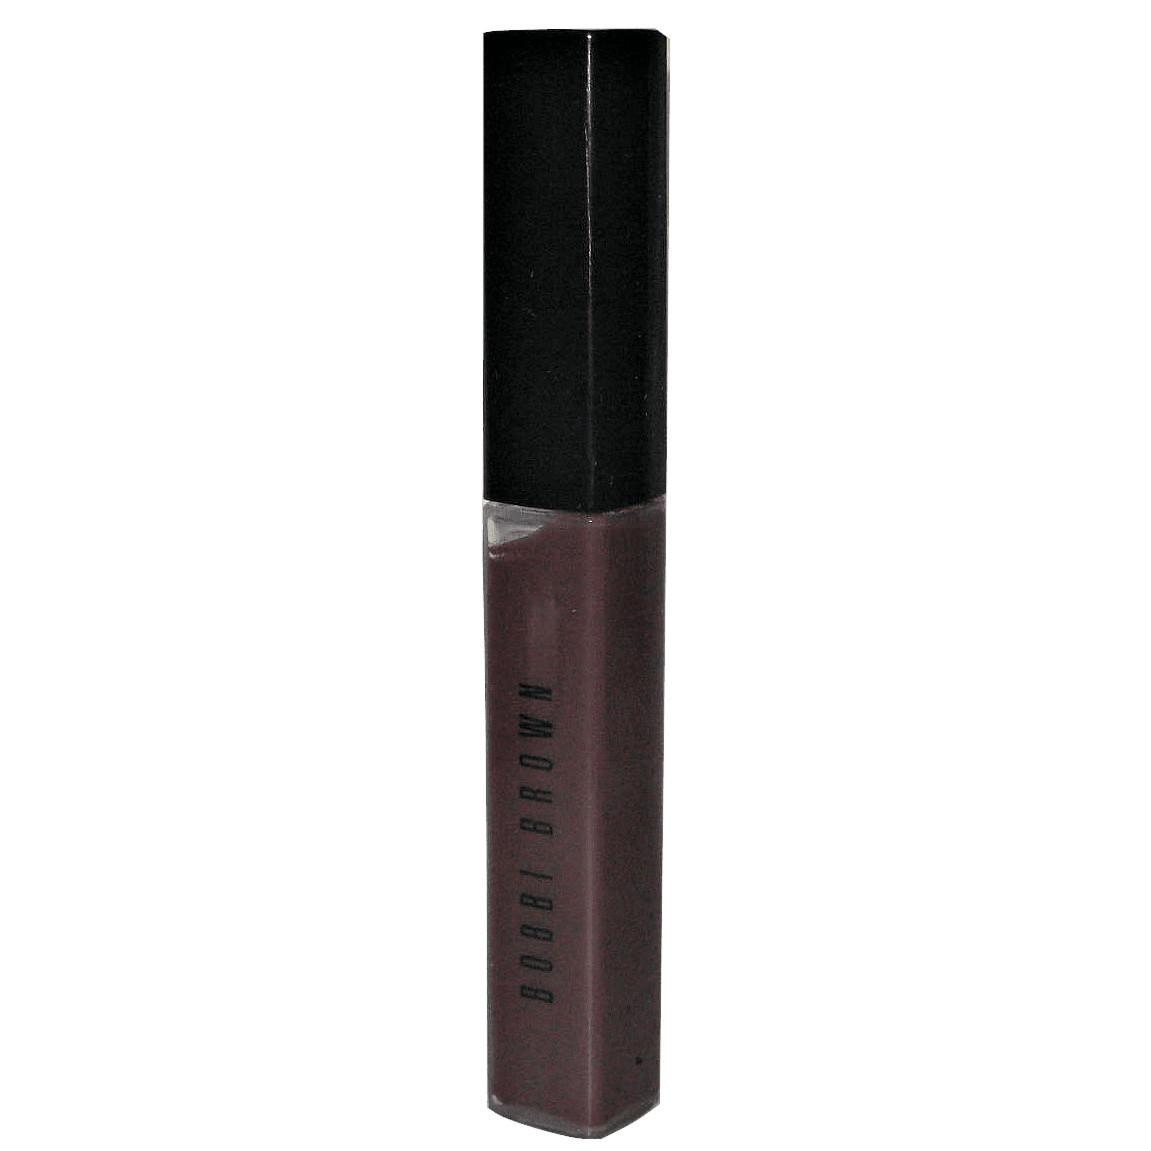 Bobbi Brown Rich Color Gloss Merlot 8